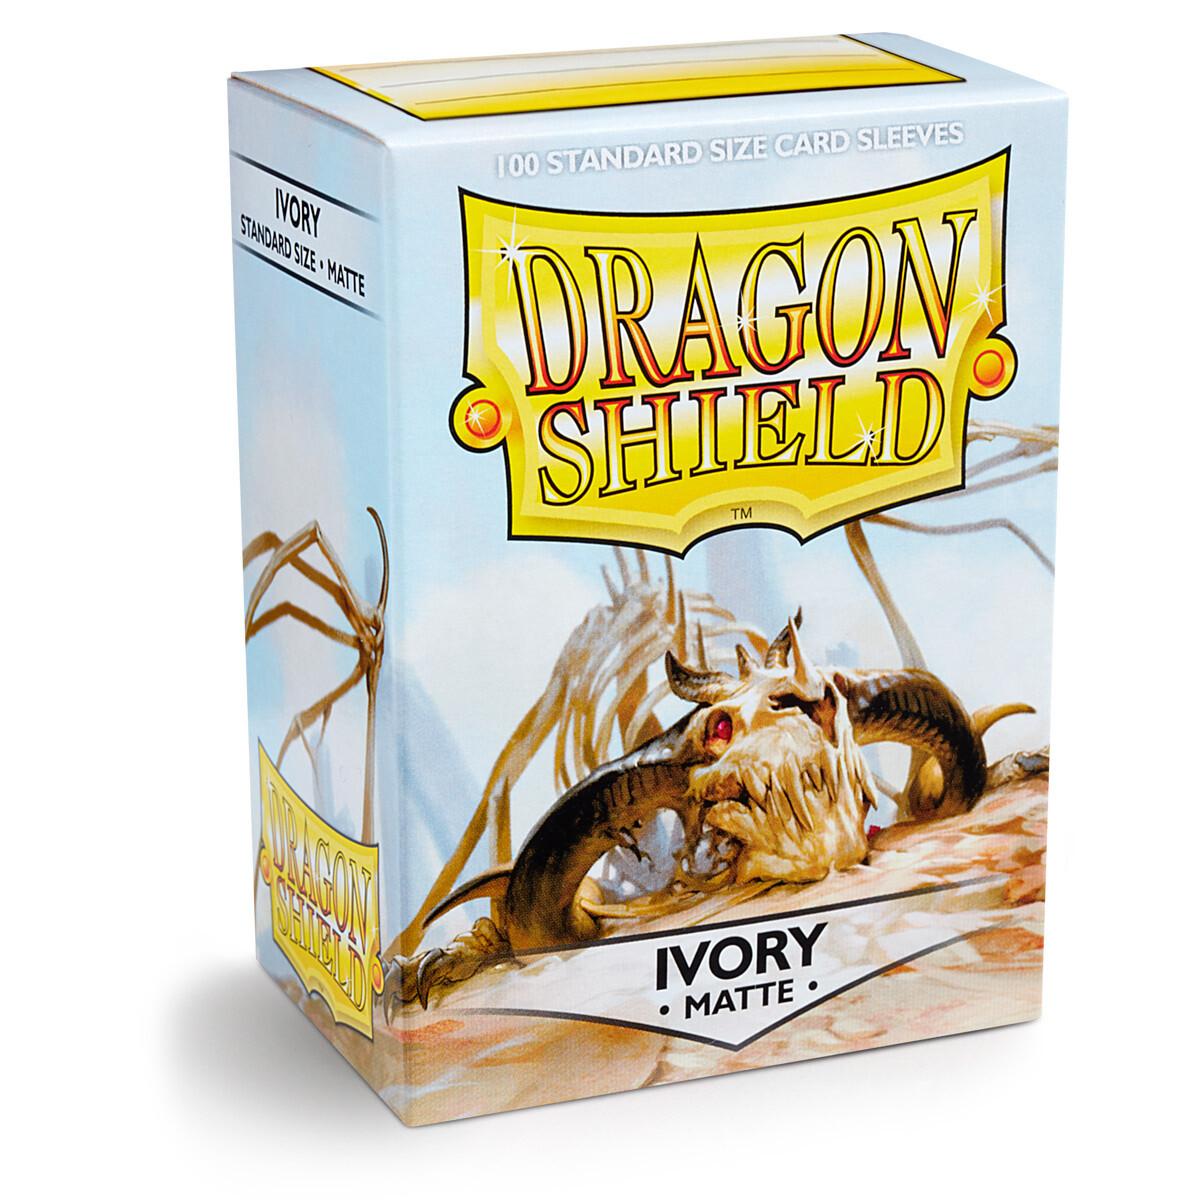 Dragon Shield 100 Sleeves - Matte Ivory